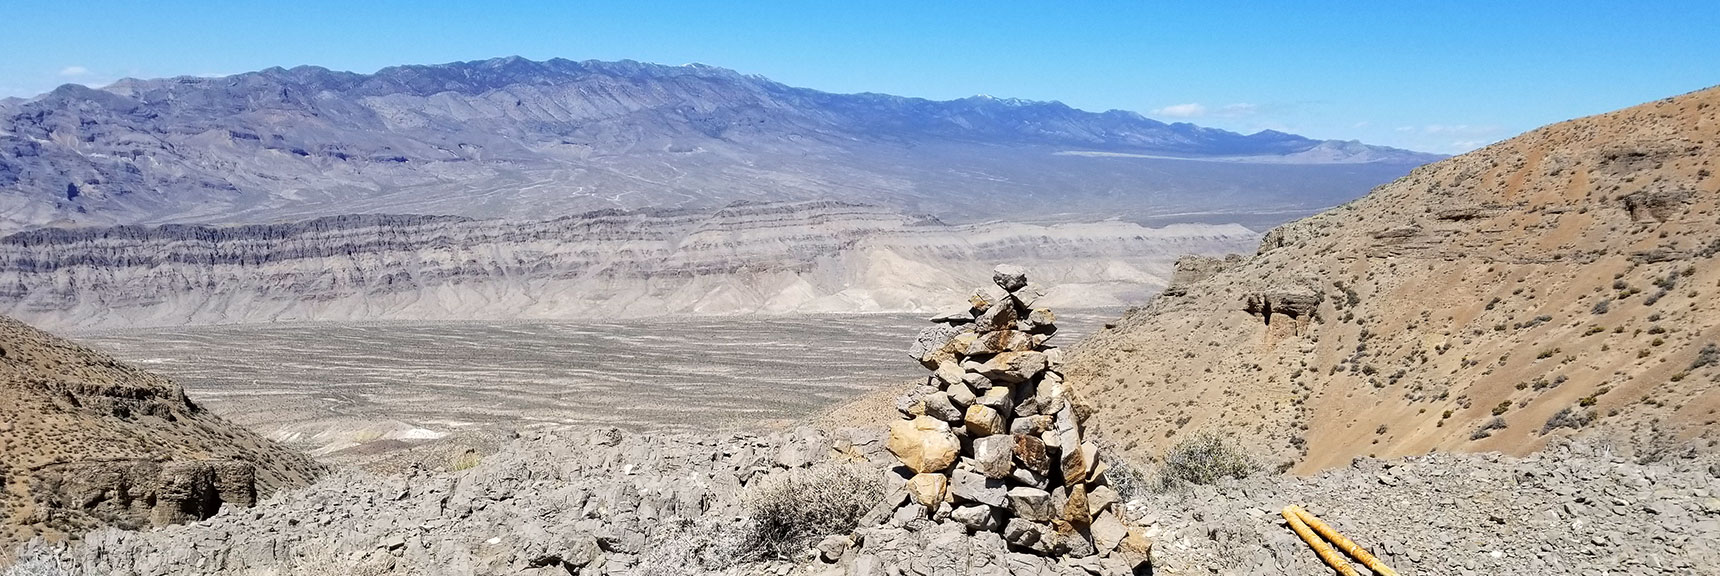 Gass Peak Nevada mid-summit descent point, view of Sheep Mountain Range.